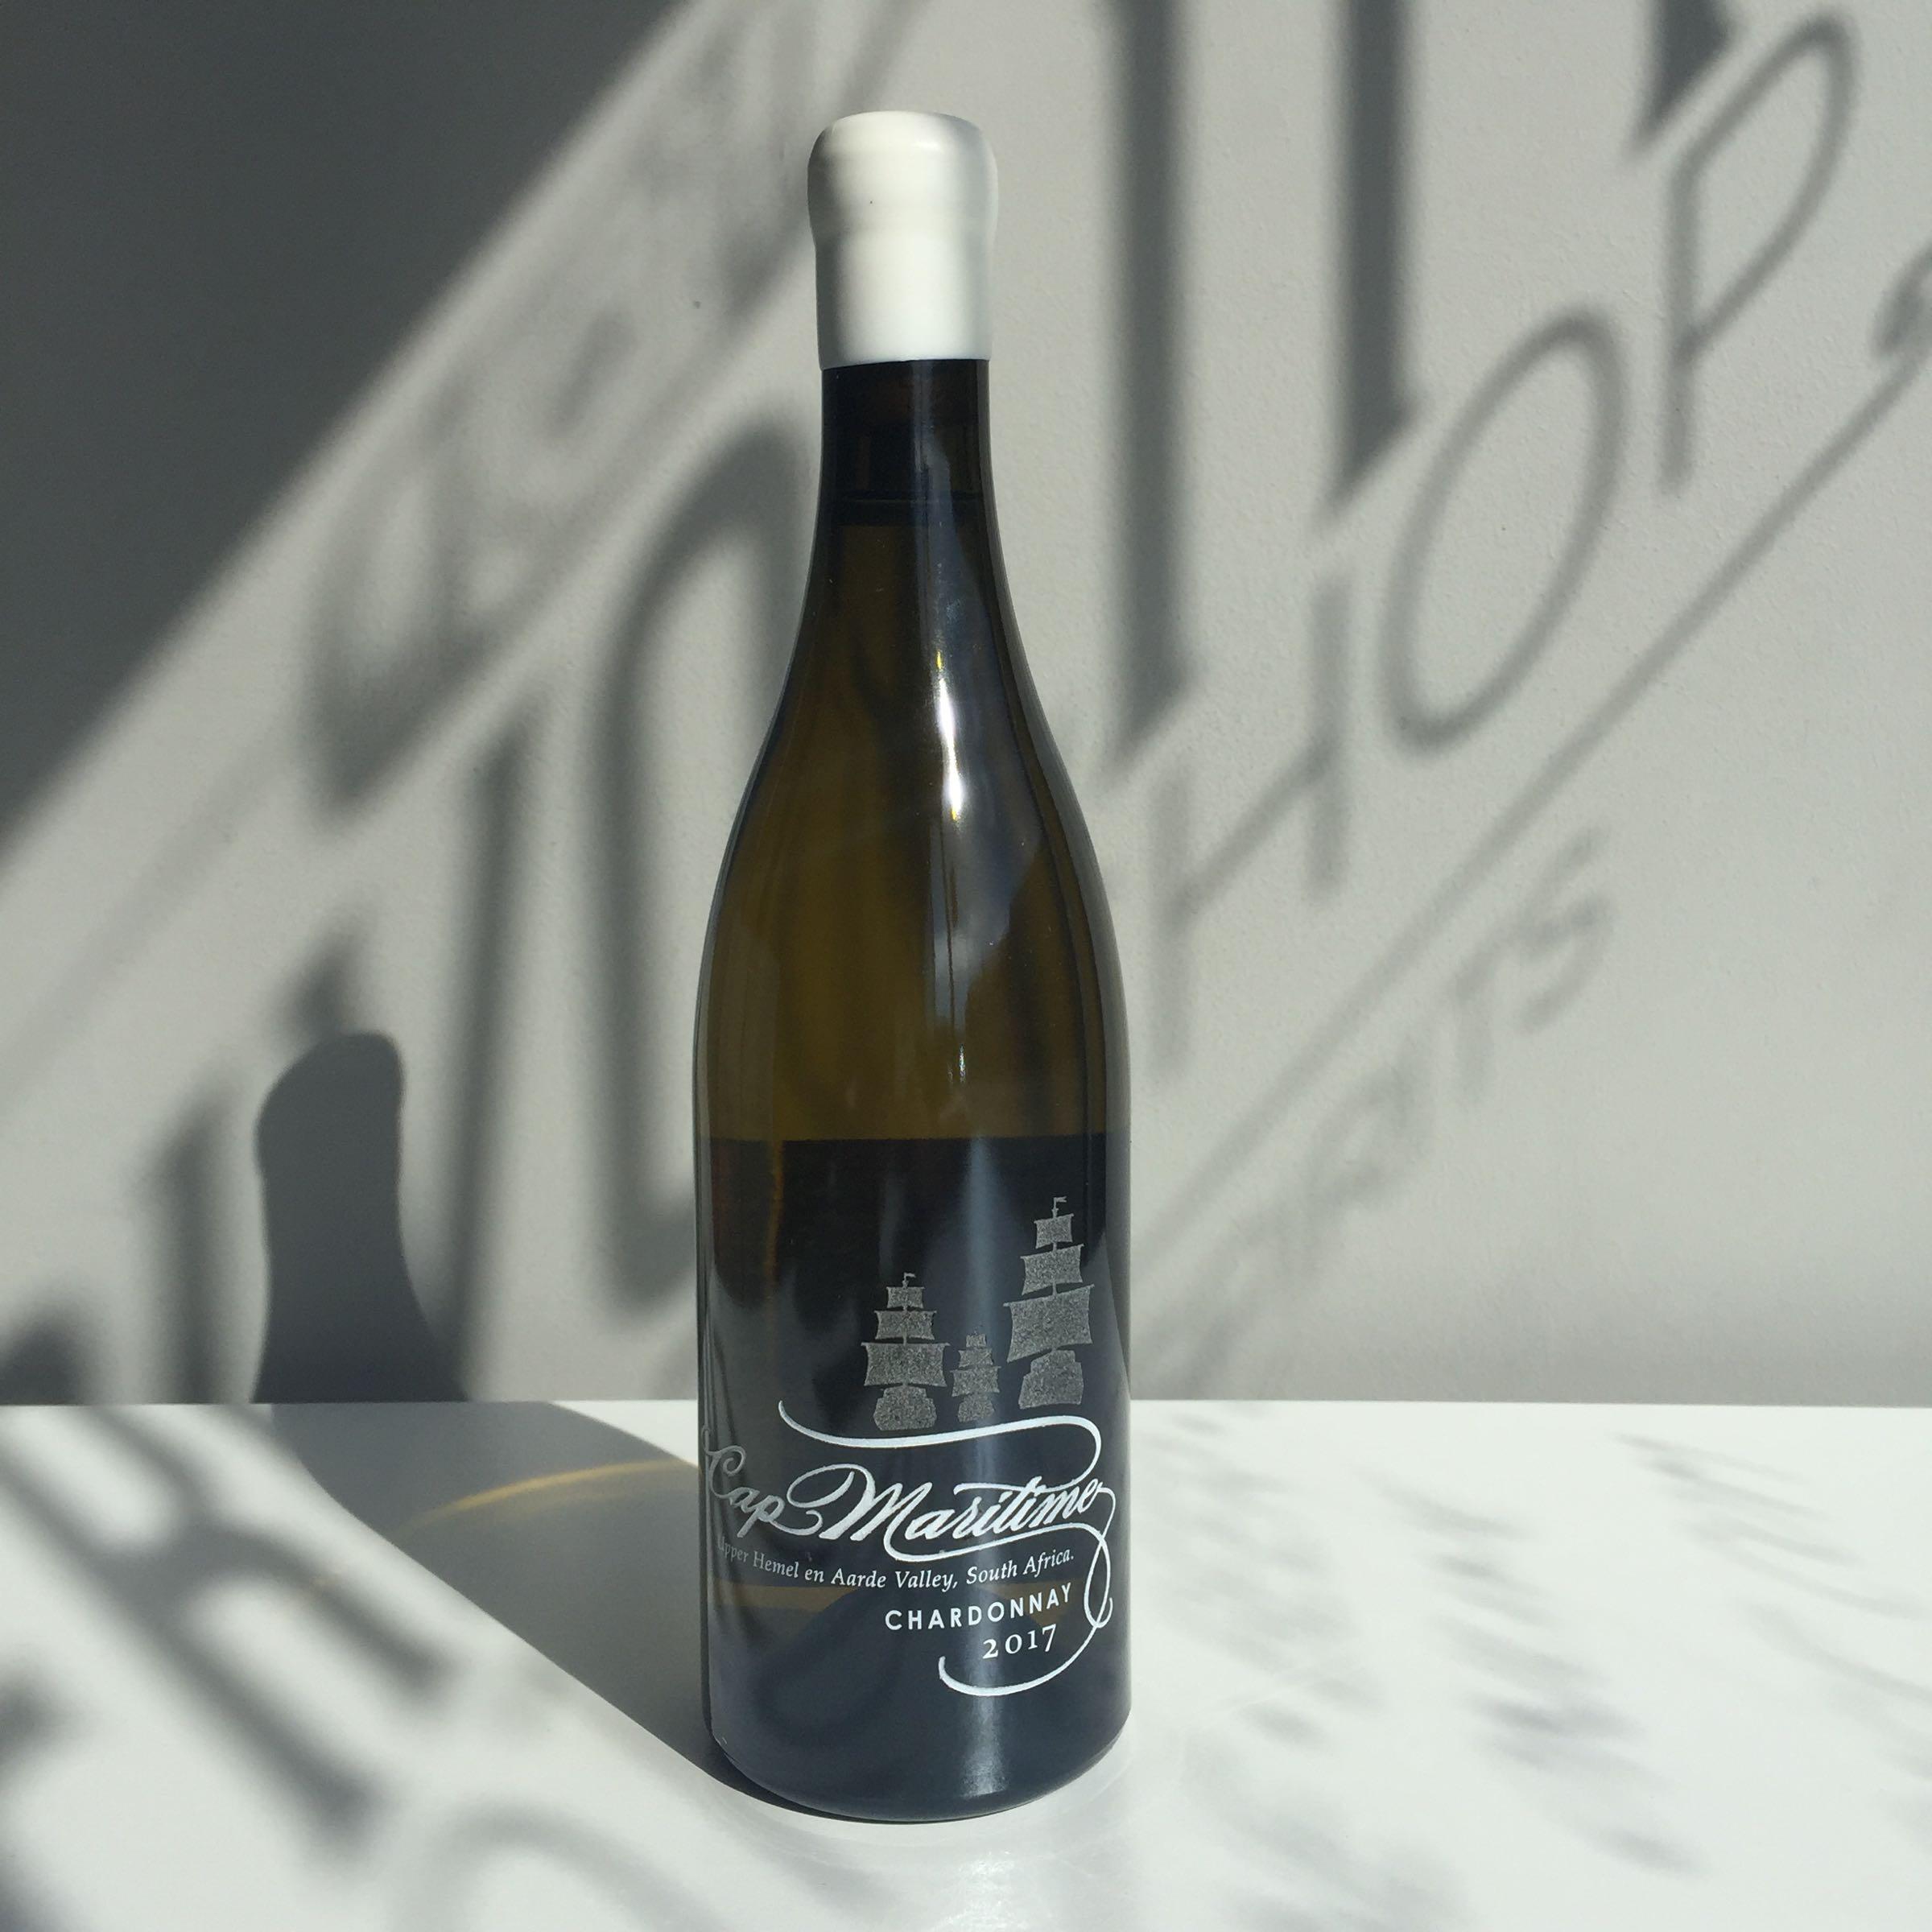 Cap Maritime - Chardonnay 2017